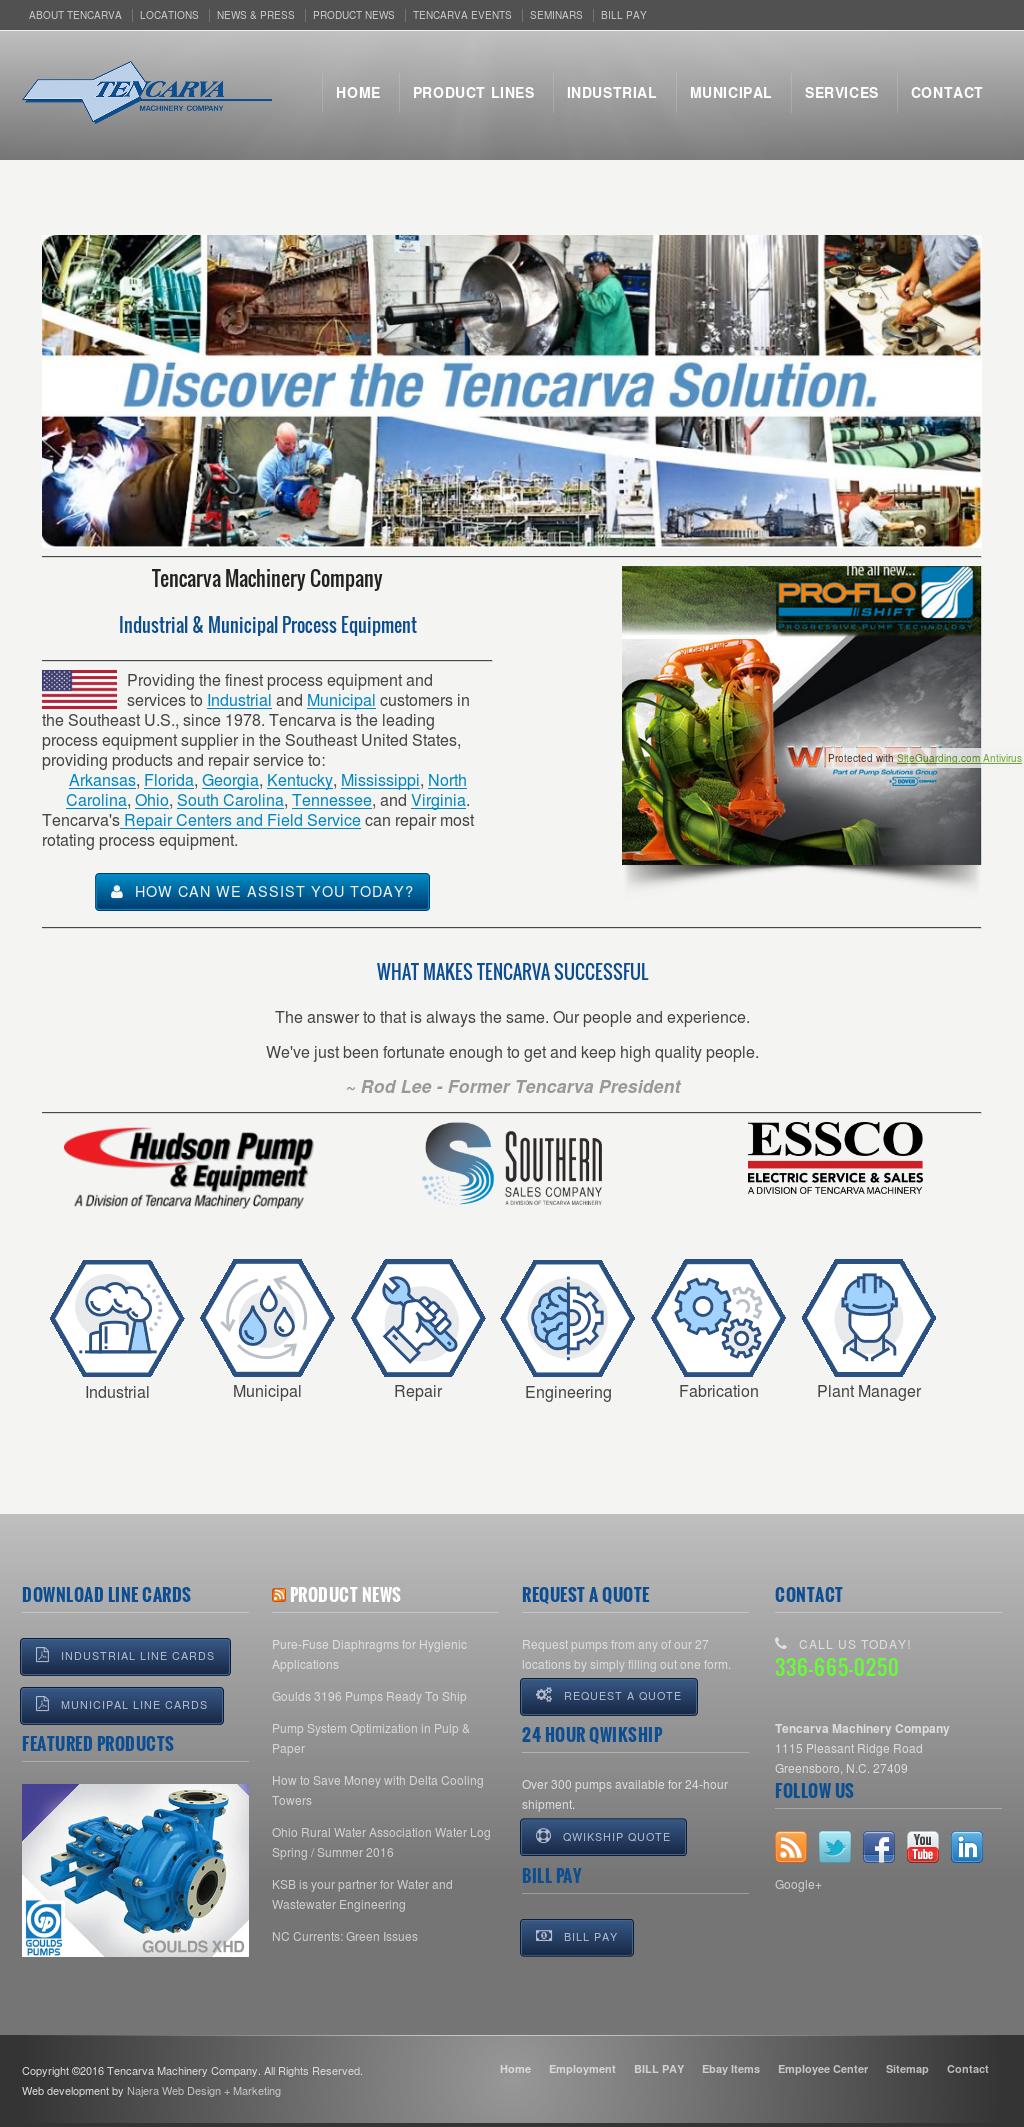 Tencarva Competitors, Revenue and Employees - Owler Company Profile